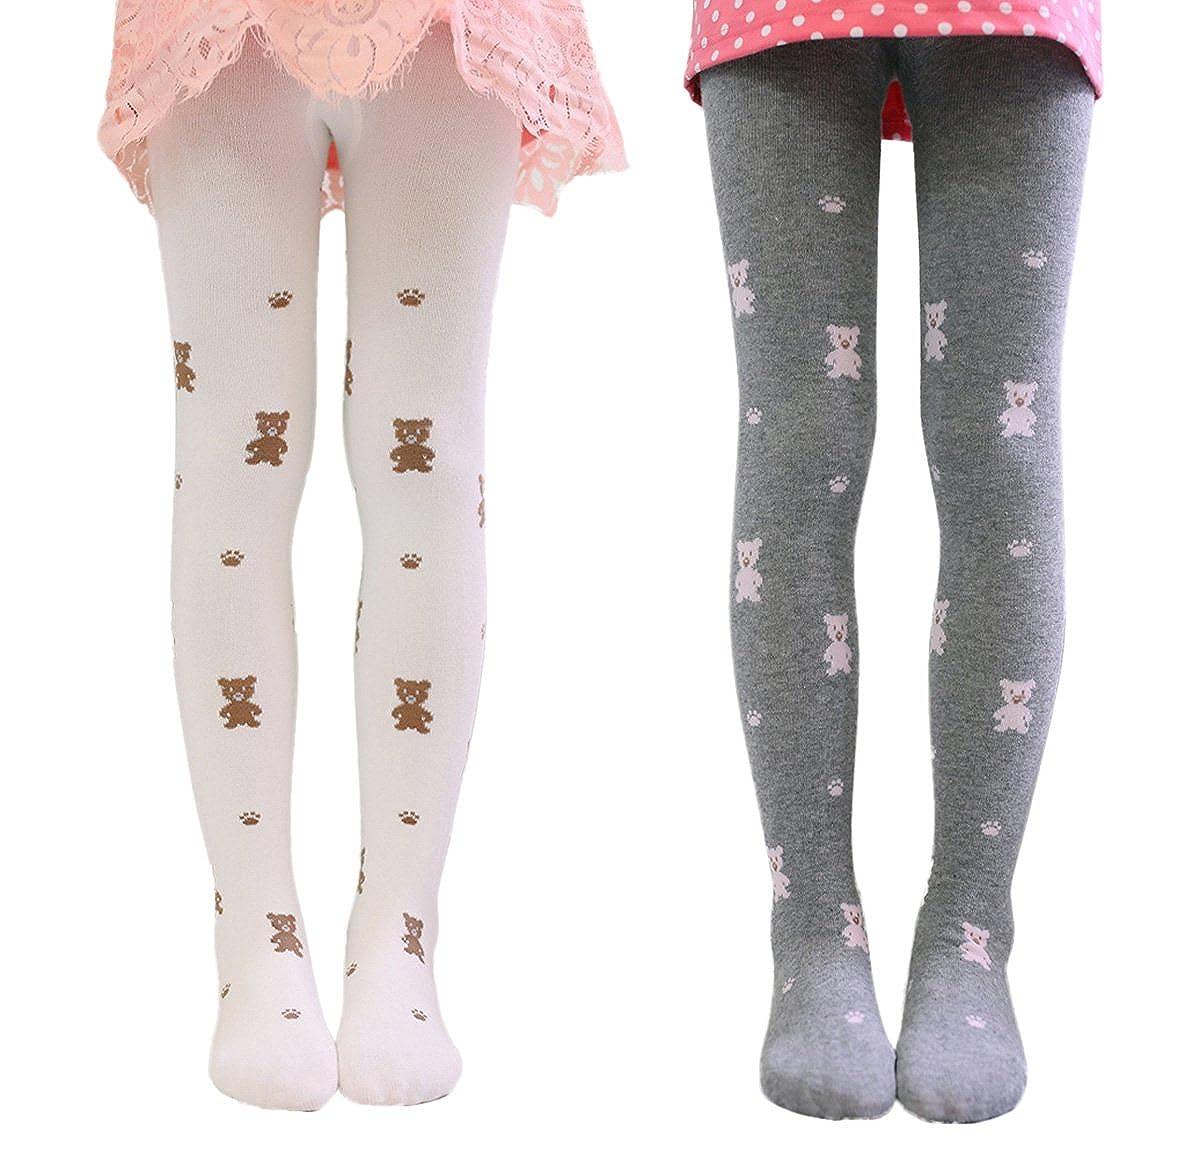 Girls Kids Cartoon Cotton Legging Pants Tight Stockings Tights 2 Pack 1-12Y Happy Cherry